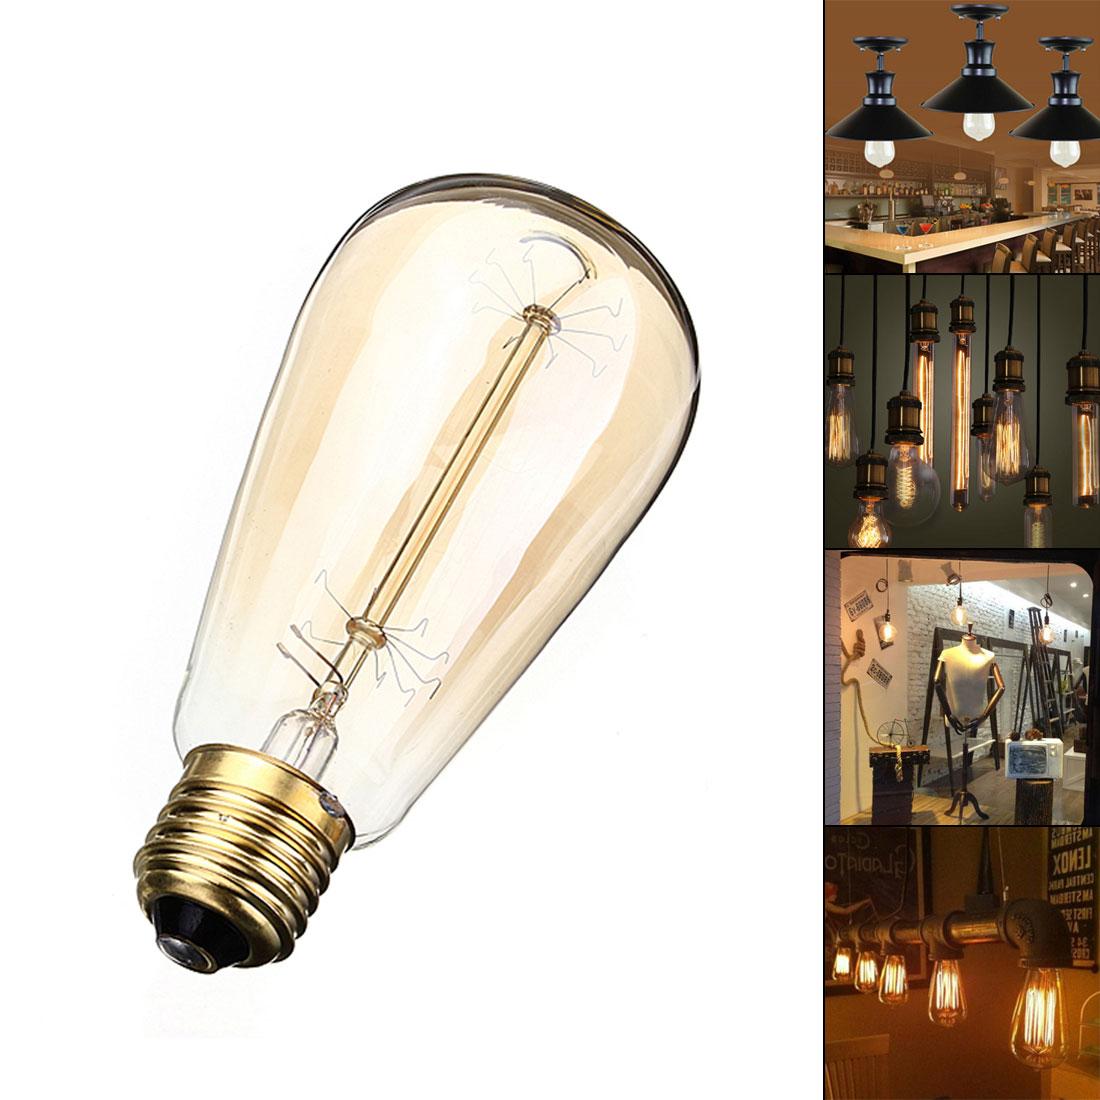 LED Light Bulb Vintage Edison E27 60w Incandescent Bulb 110v 220v Holiday Lamp Pyrotechnics Bulb Christmas Decoration for Home